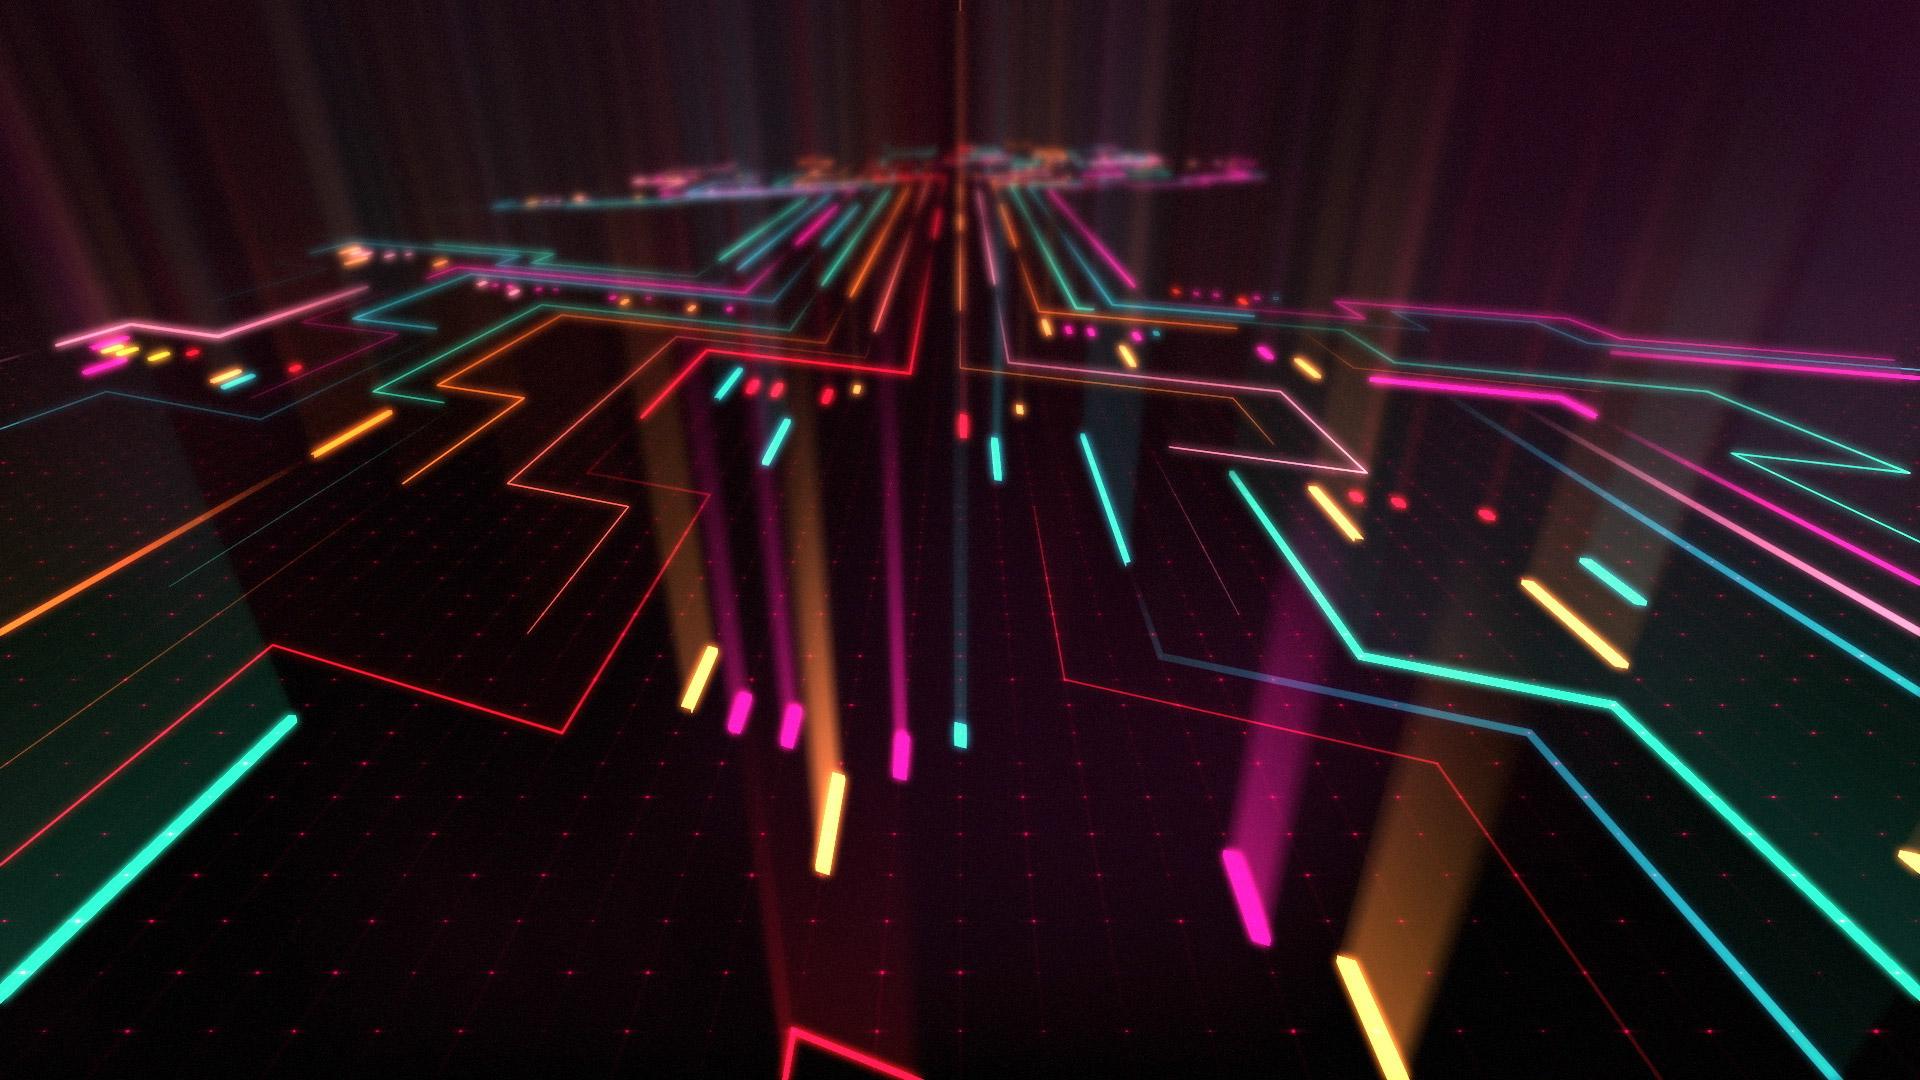 Abstract Neon Digital Art